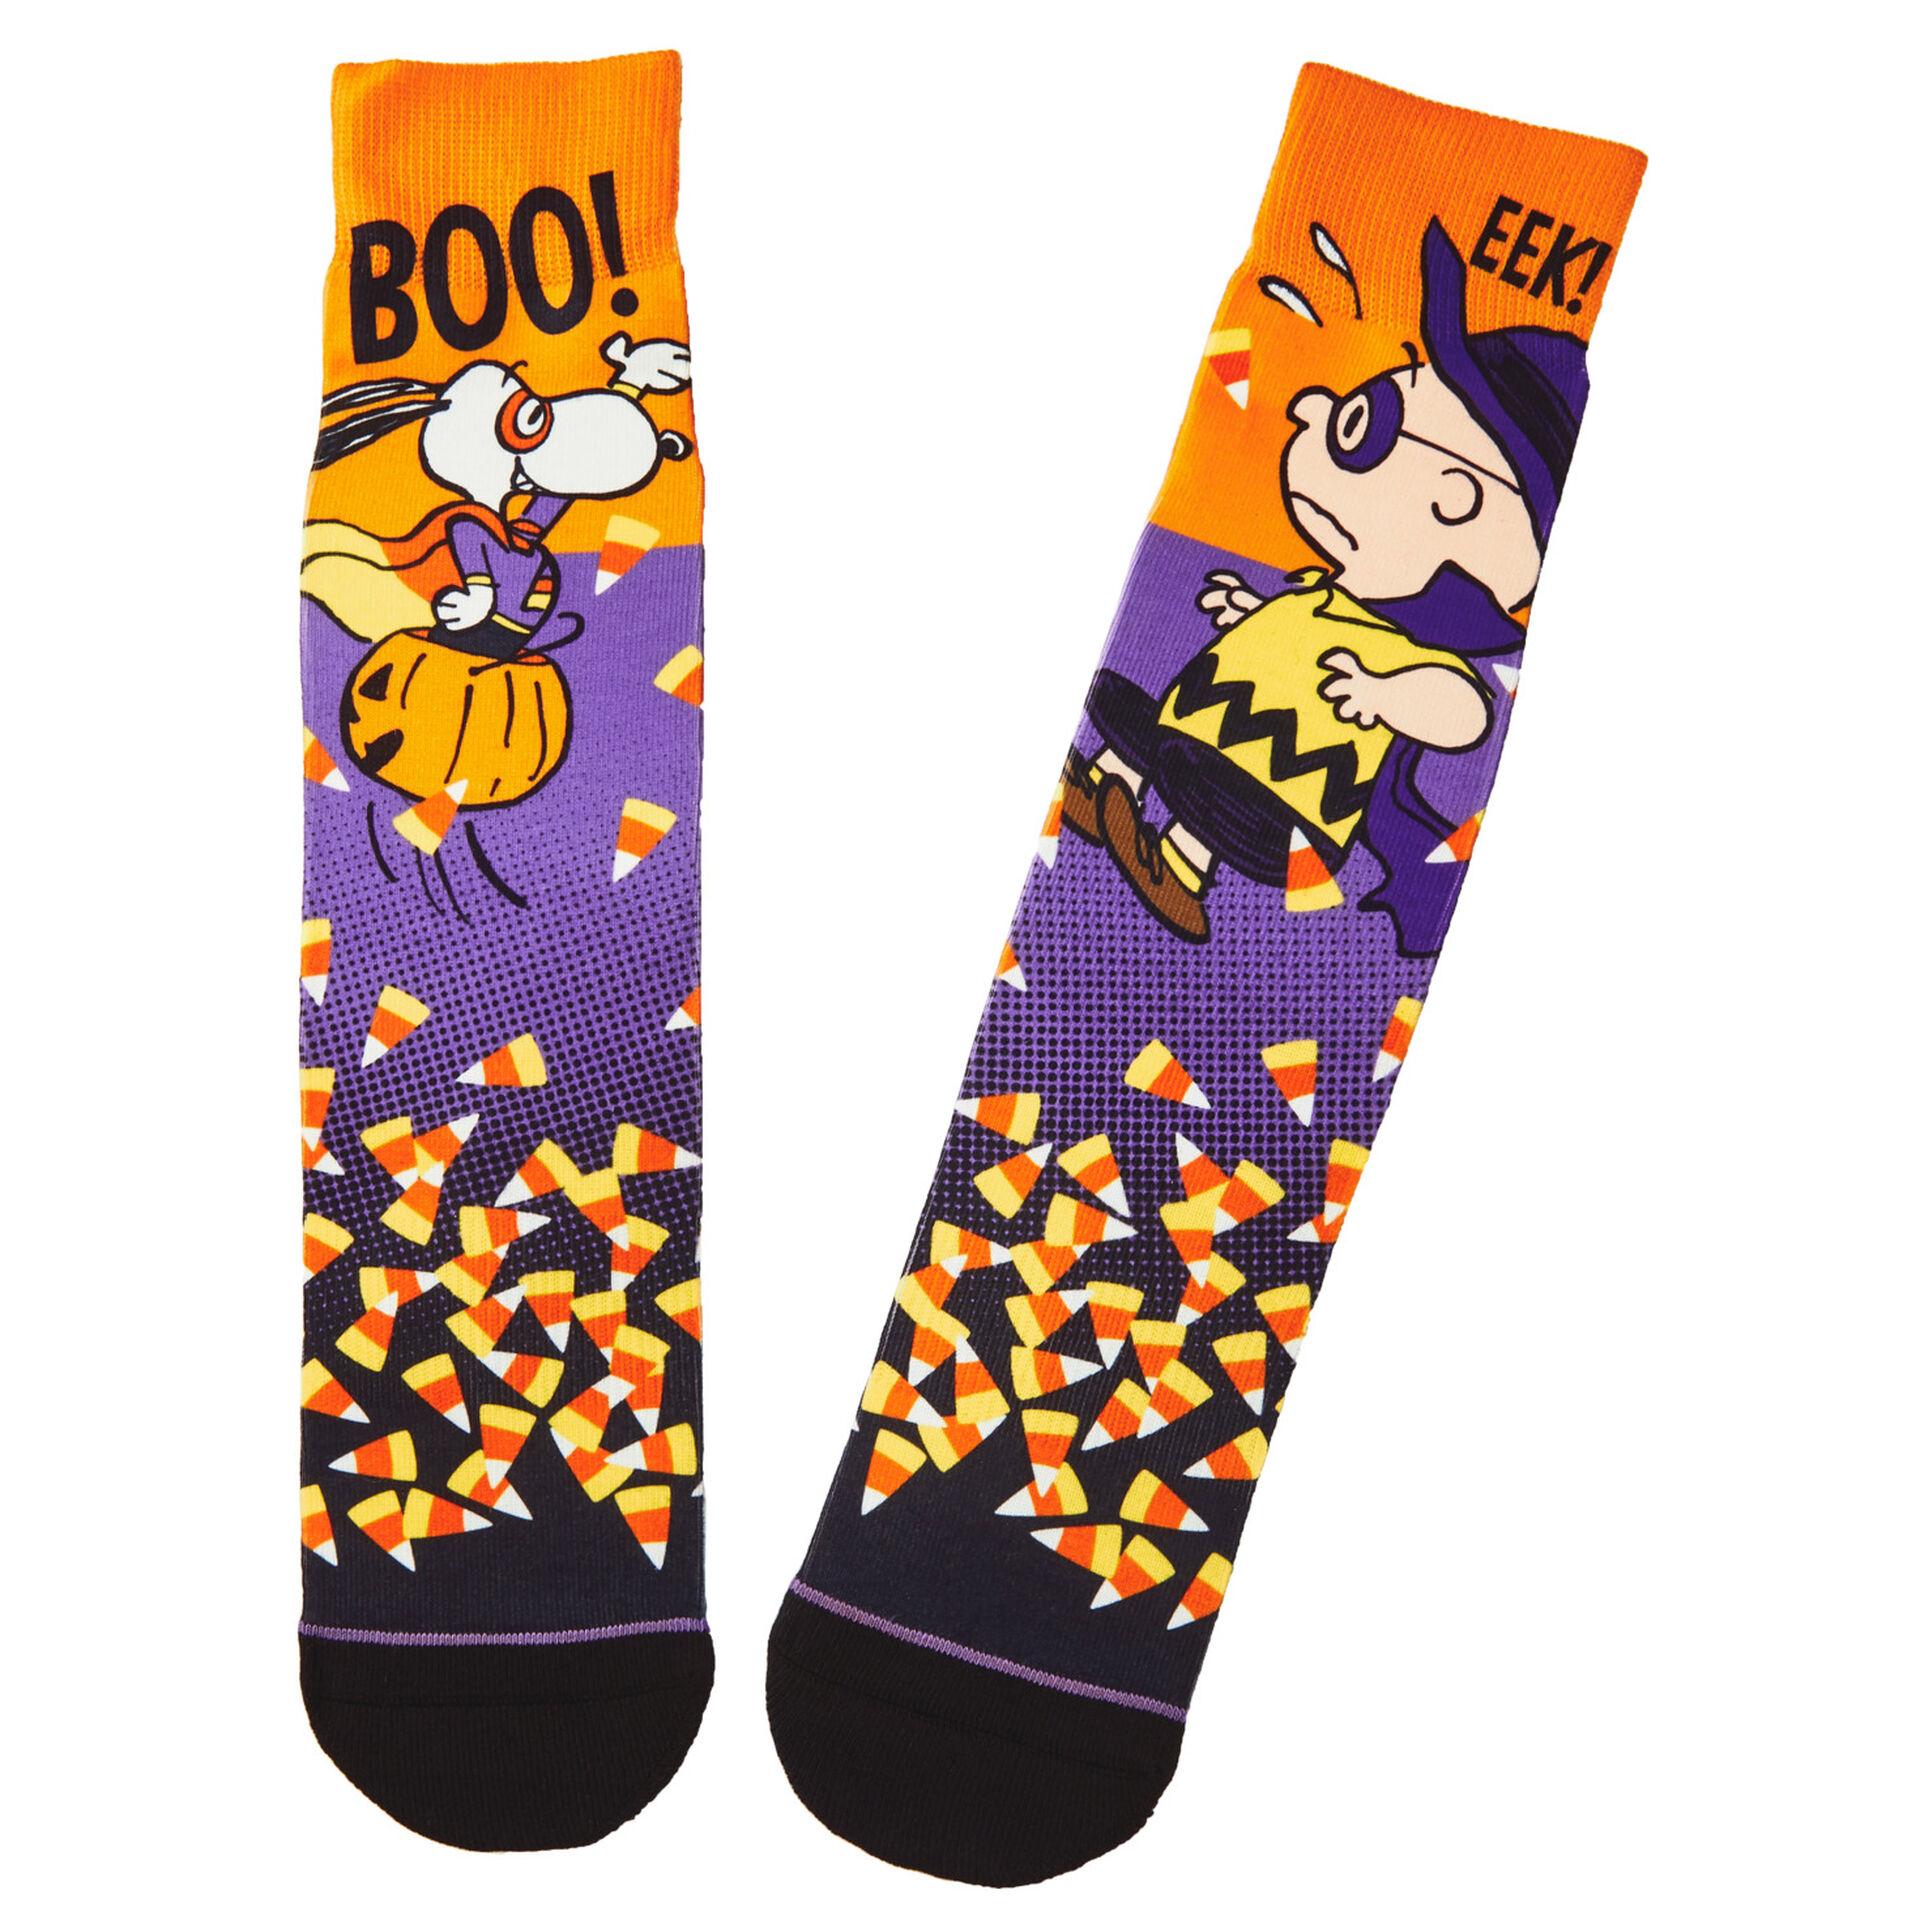 Hallmark Halloween Peanuts 2020 Peanuts® Snoopy the Candy Crusader Halloween Novelty Crew Socks